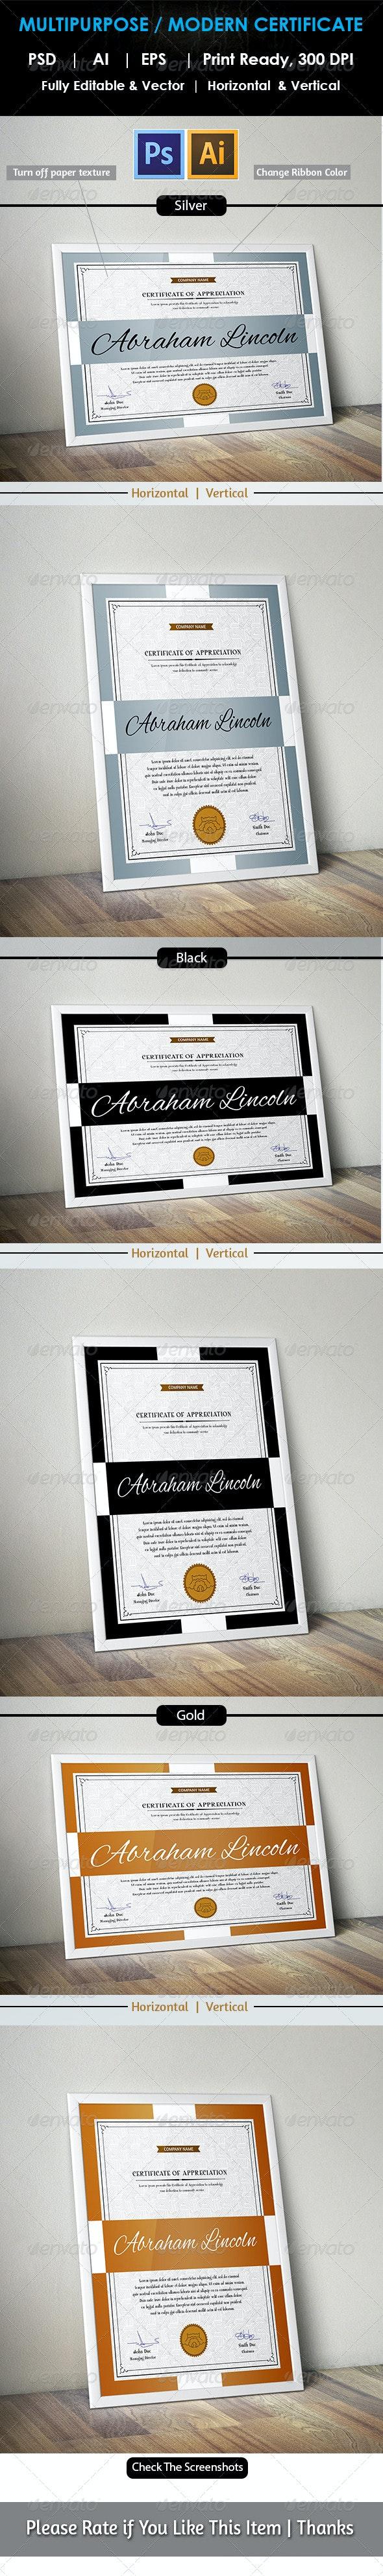 Simple Multipurpose Certificate GD005 - Certificates Stationery